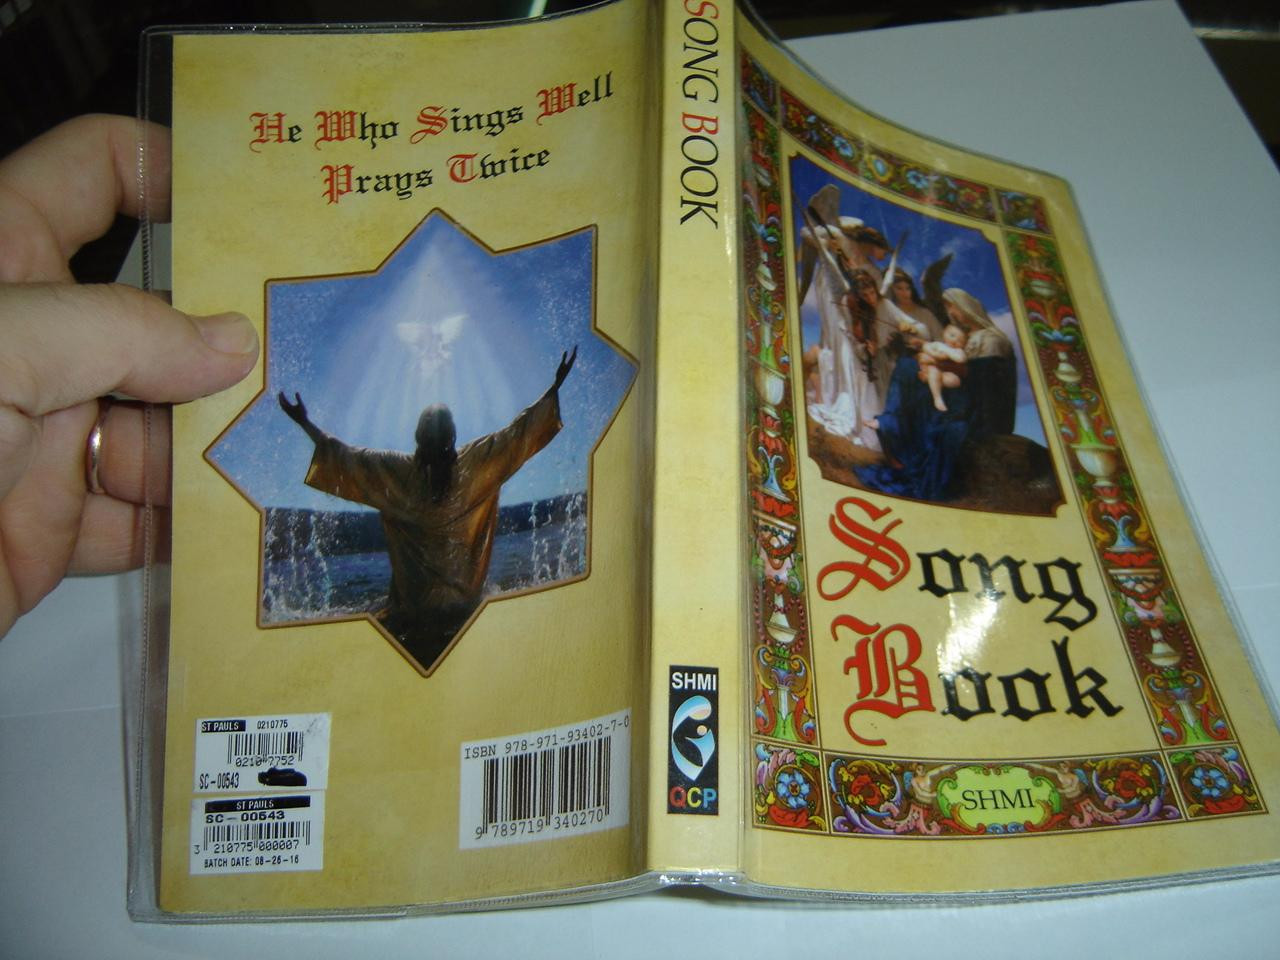 Song Book – Shmi / For Philippine Catholics / Entrance, Kyrie, Gloria,  Alleluia, Sanctus, Offertory, Acclamation, Amen, Pater, Doxology, Agnus  Dei,